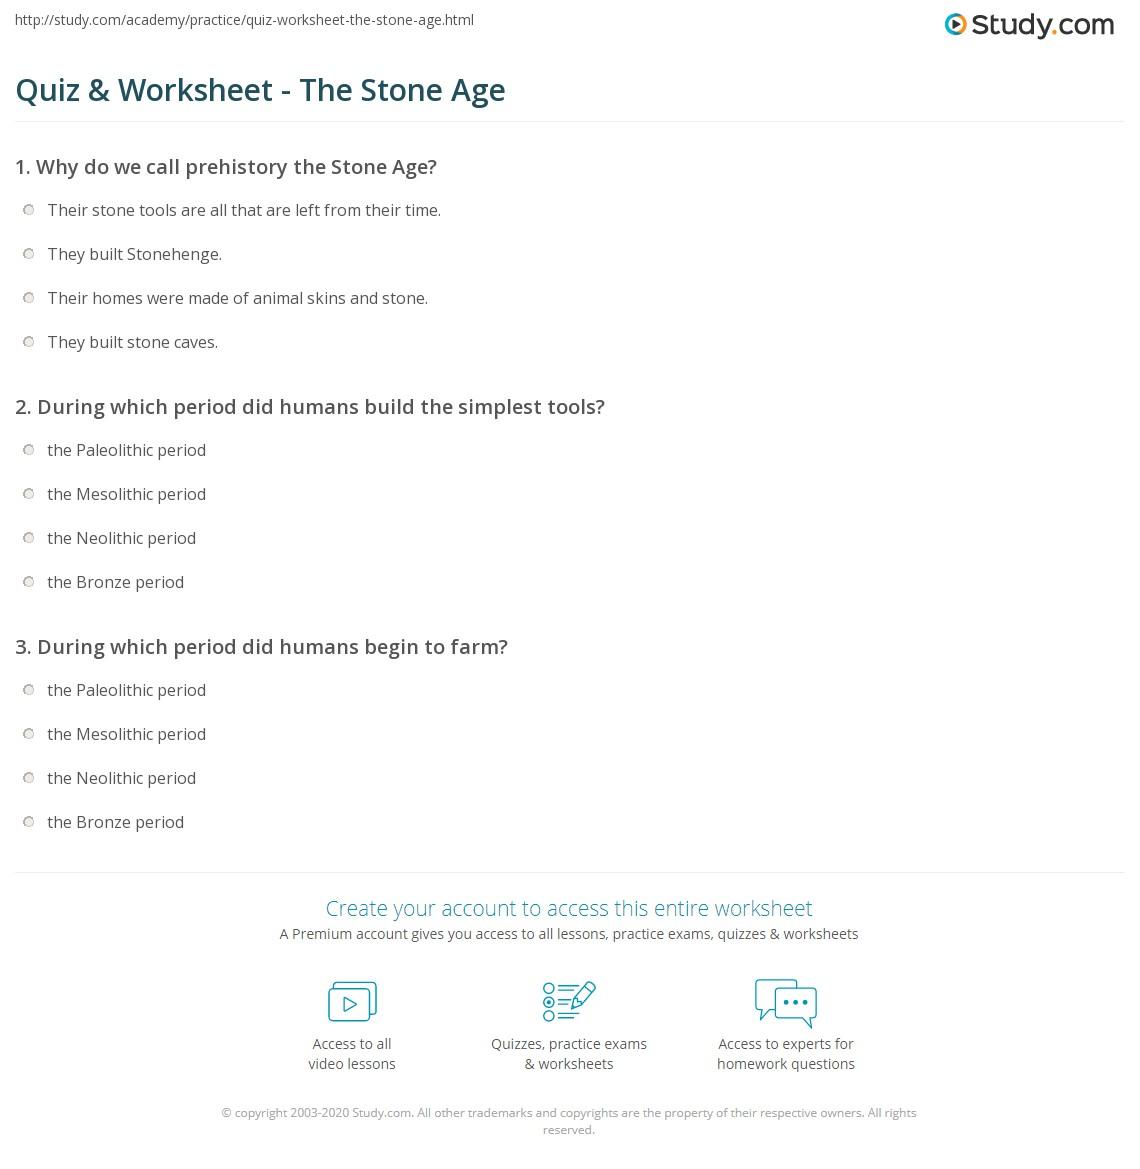 Quiz & Worksheet - The Stone Age | Study.com